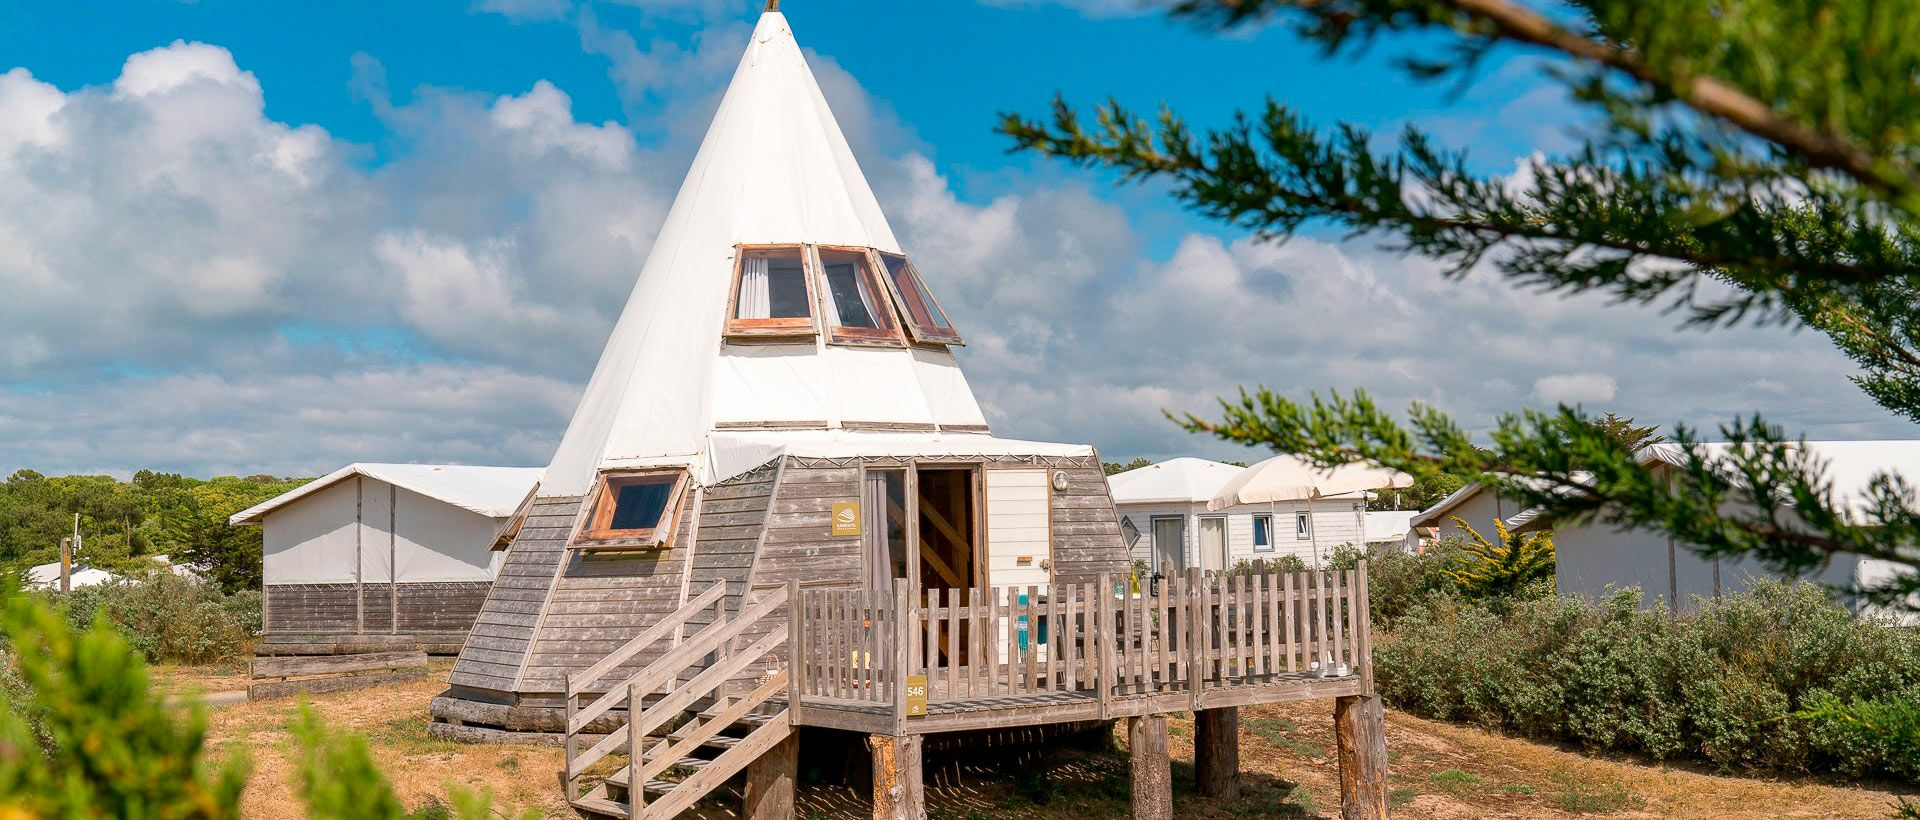 Camping Originele accommodaties